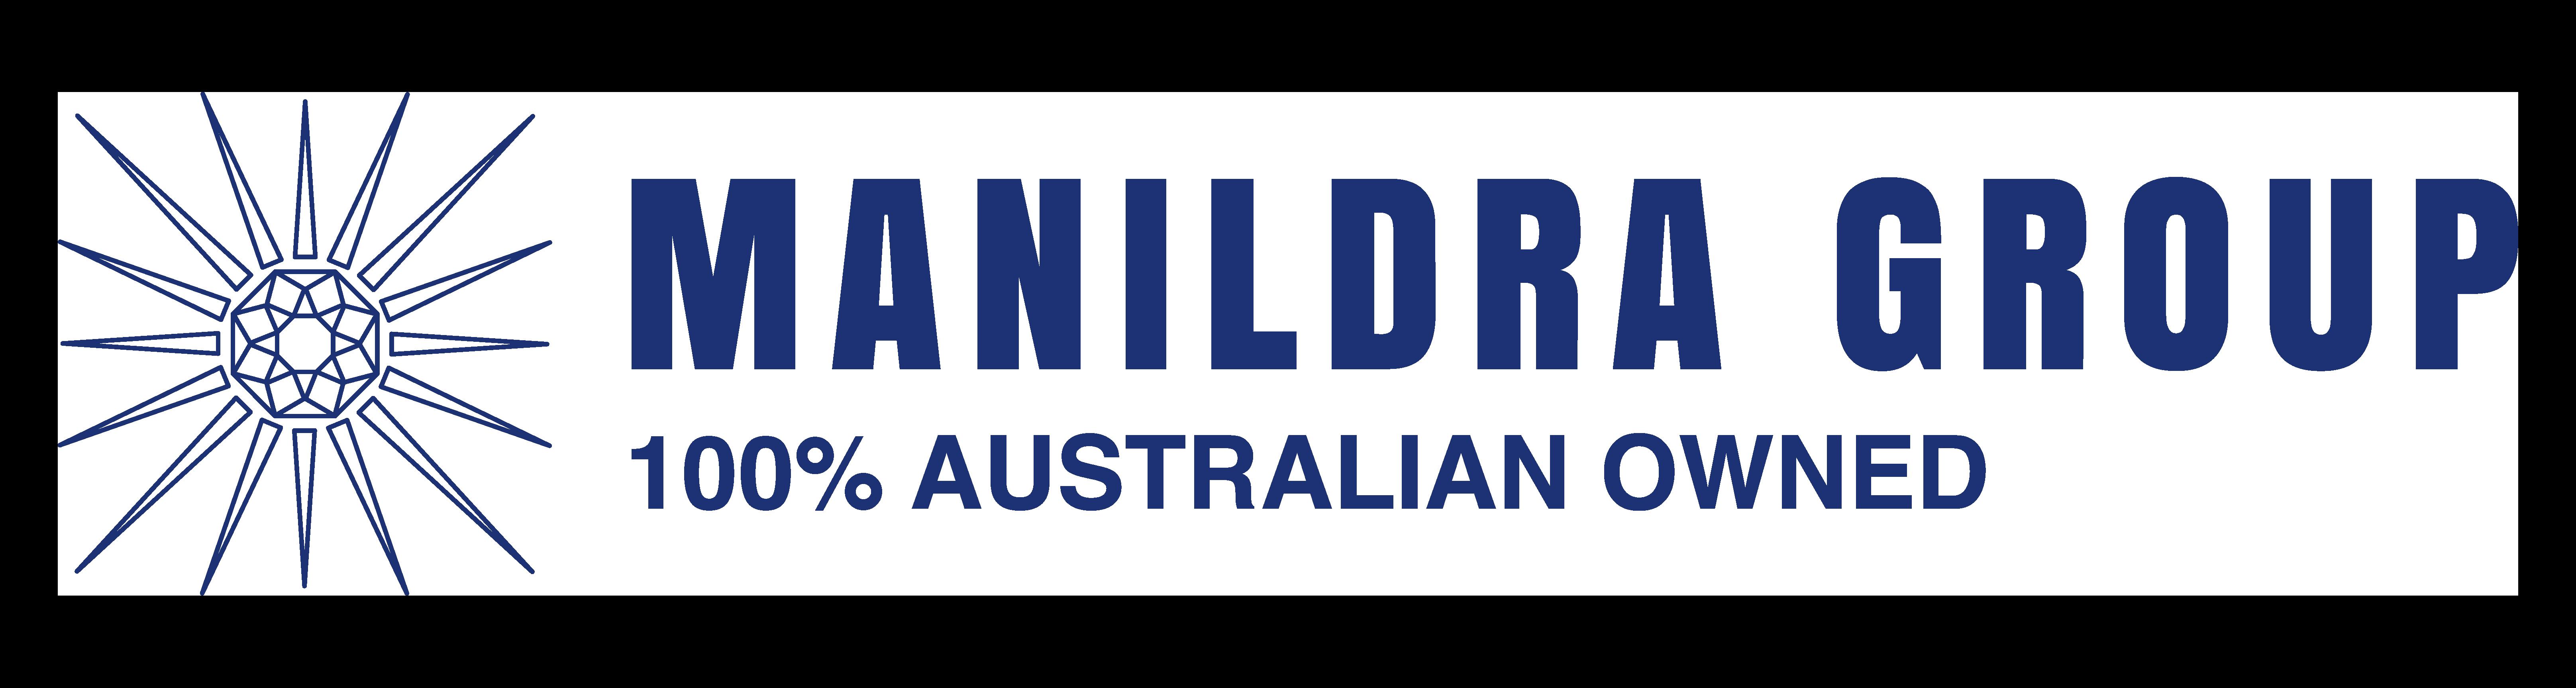 Manildra Group